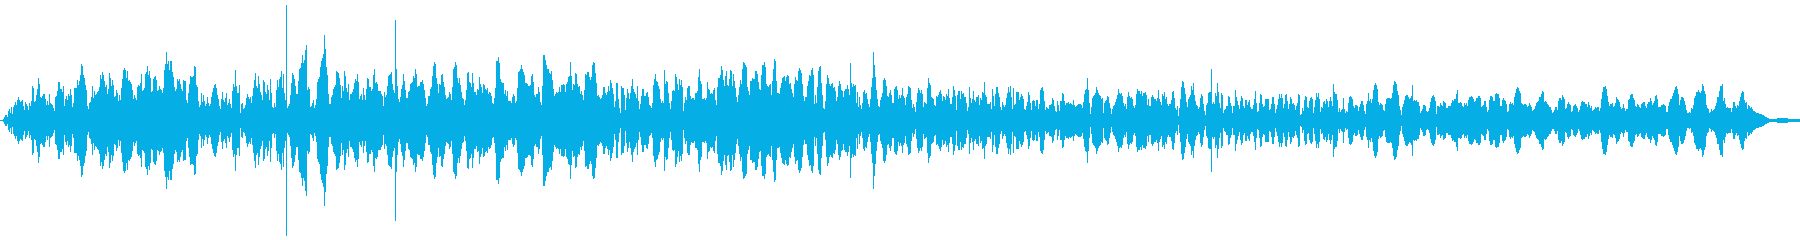 SciFi EC01_89_2の再生済みの波形